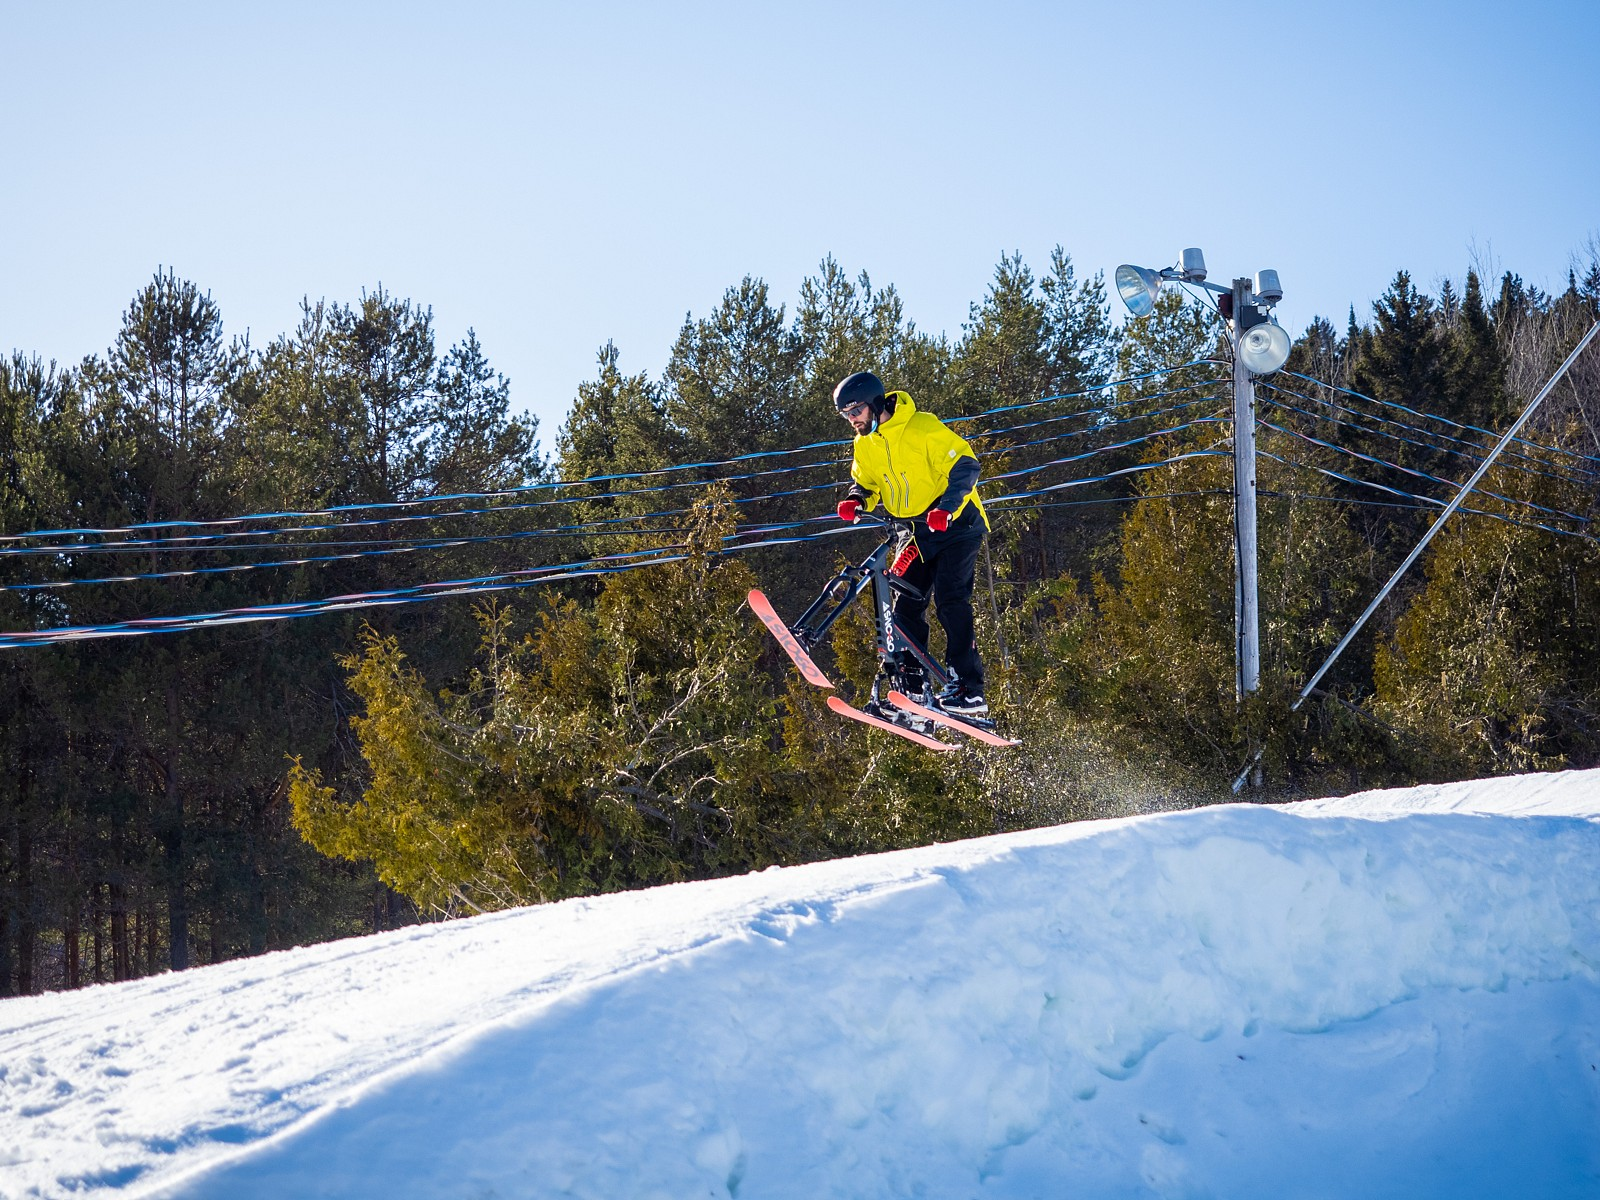 hit jump  - philippemarceau - Mountain Biking Pictures - Vital MTB